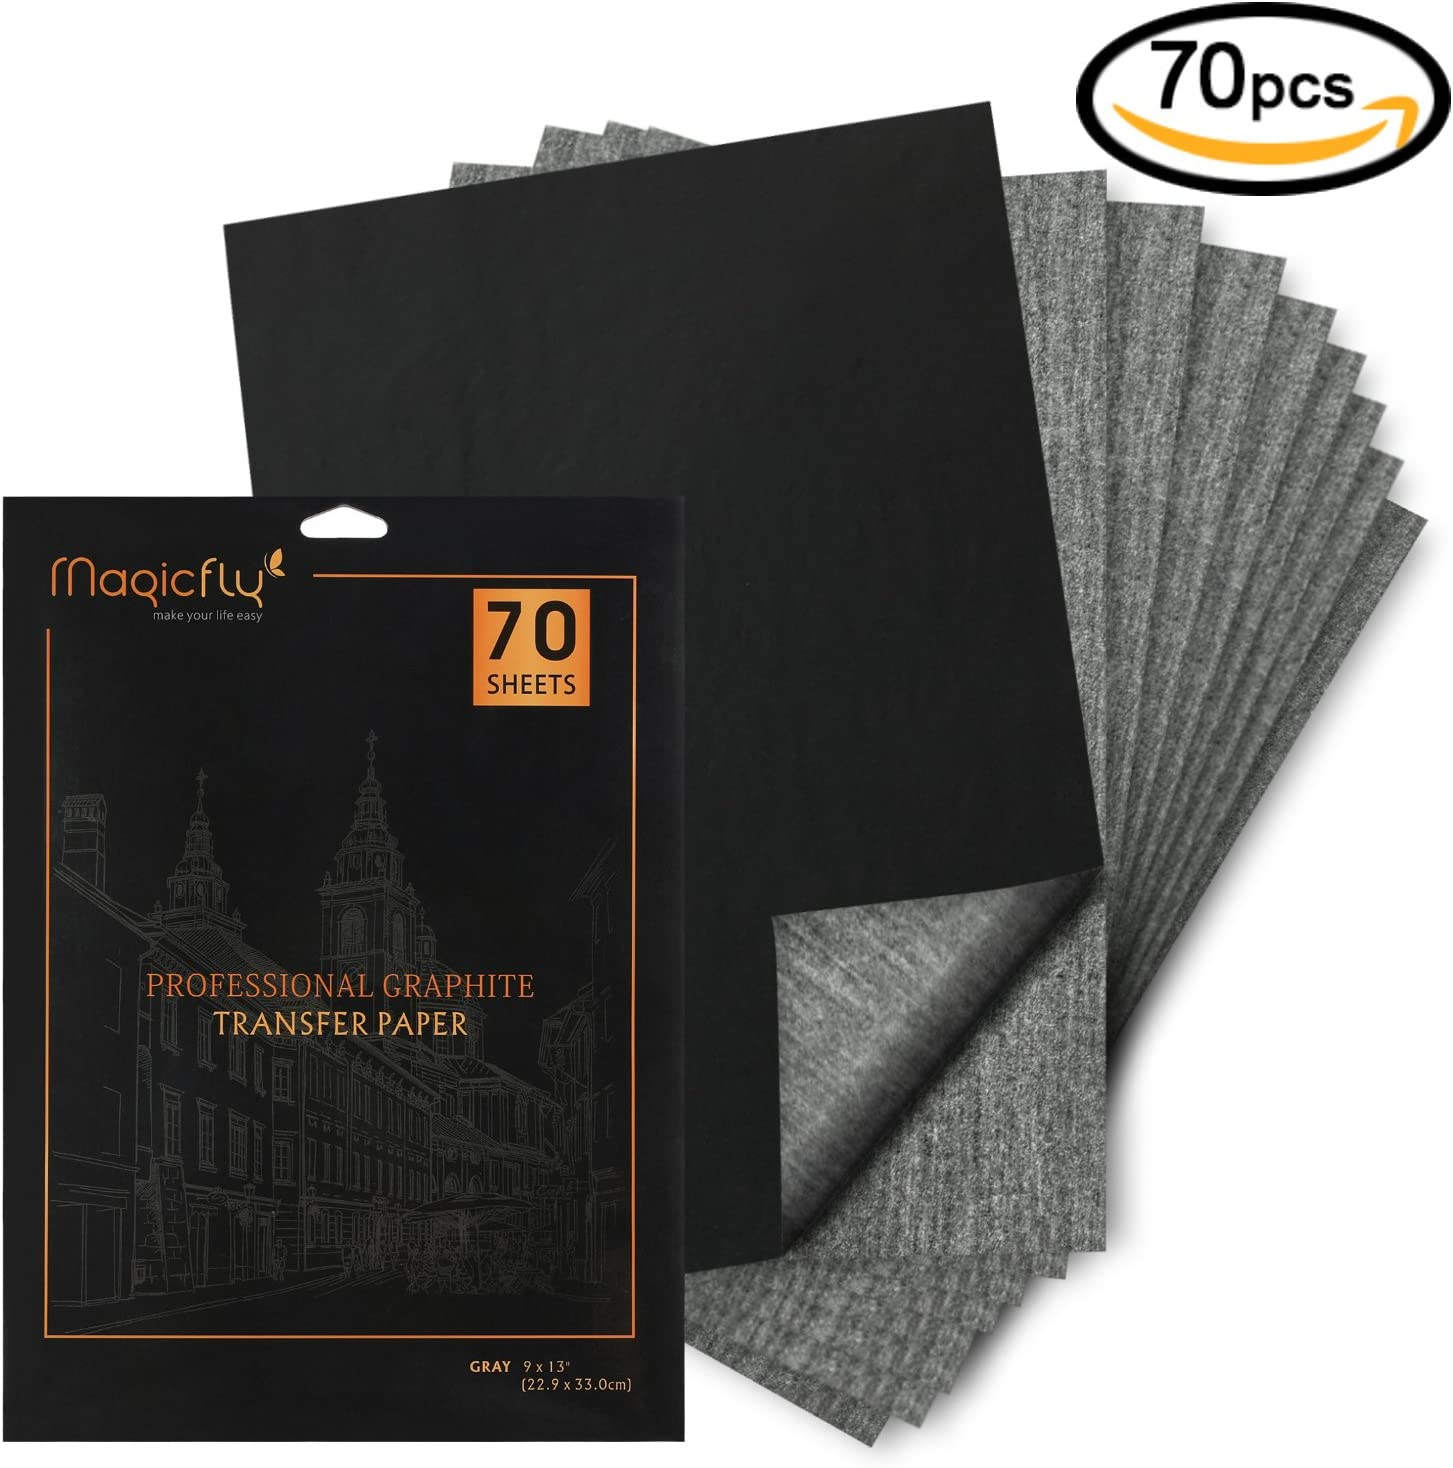 WEKON 100 Hojas Papel de Transfer Copia A4 Papel Carbono Transferencia para Madera Papel Lienzo